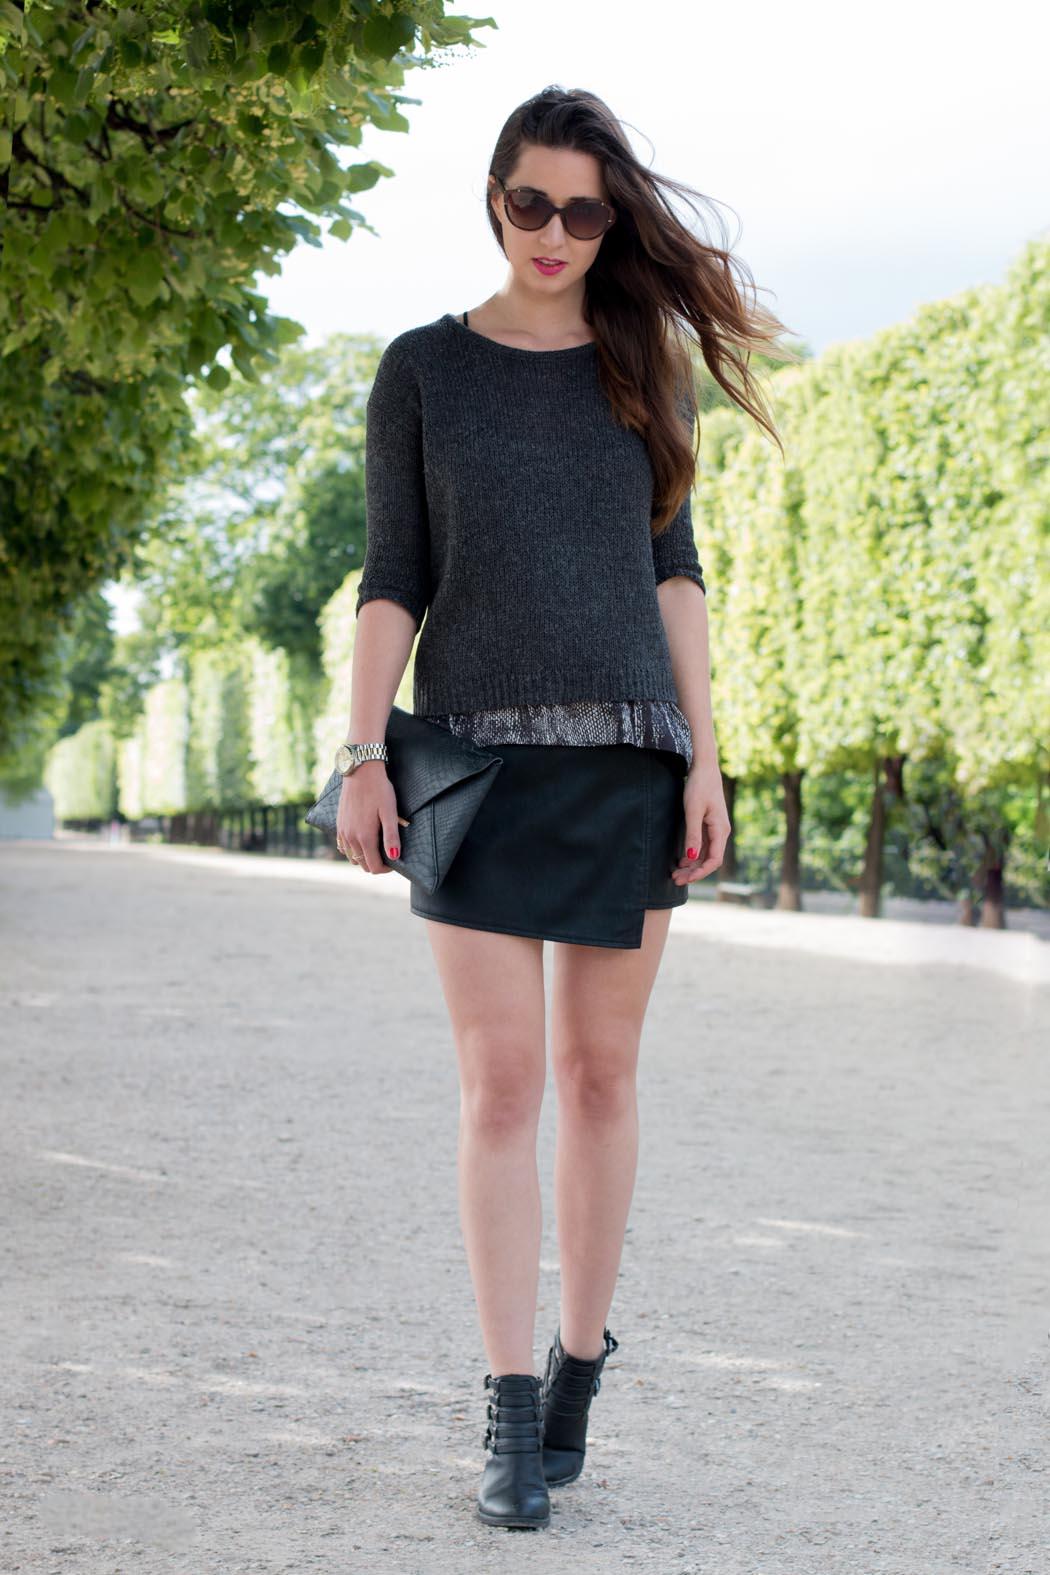 Lindarella-Paris-Fashionblogger-Michael-Kors-Bcbg-allblack-8